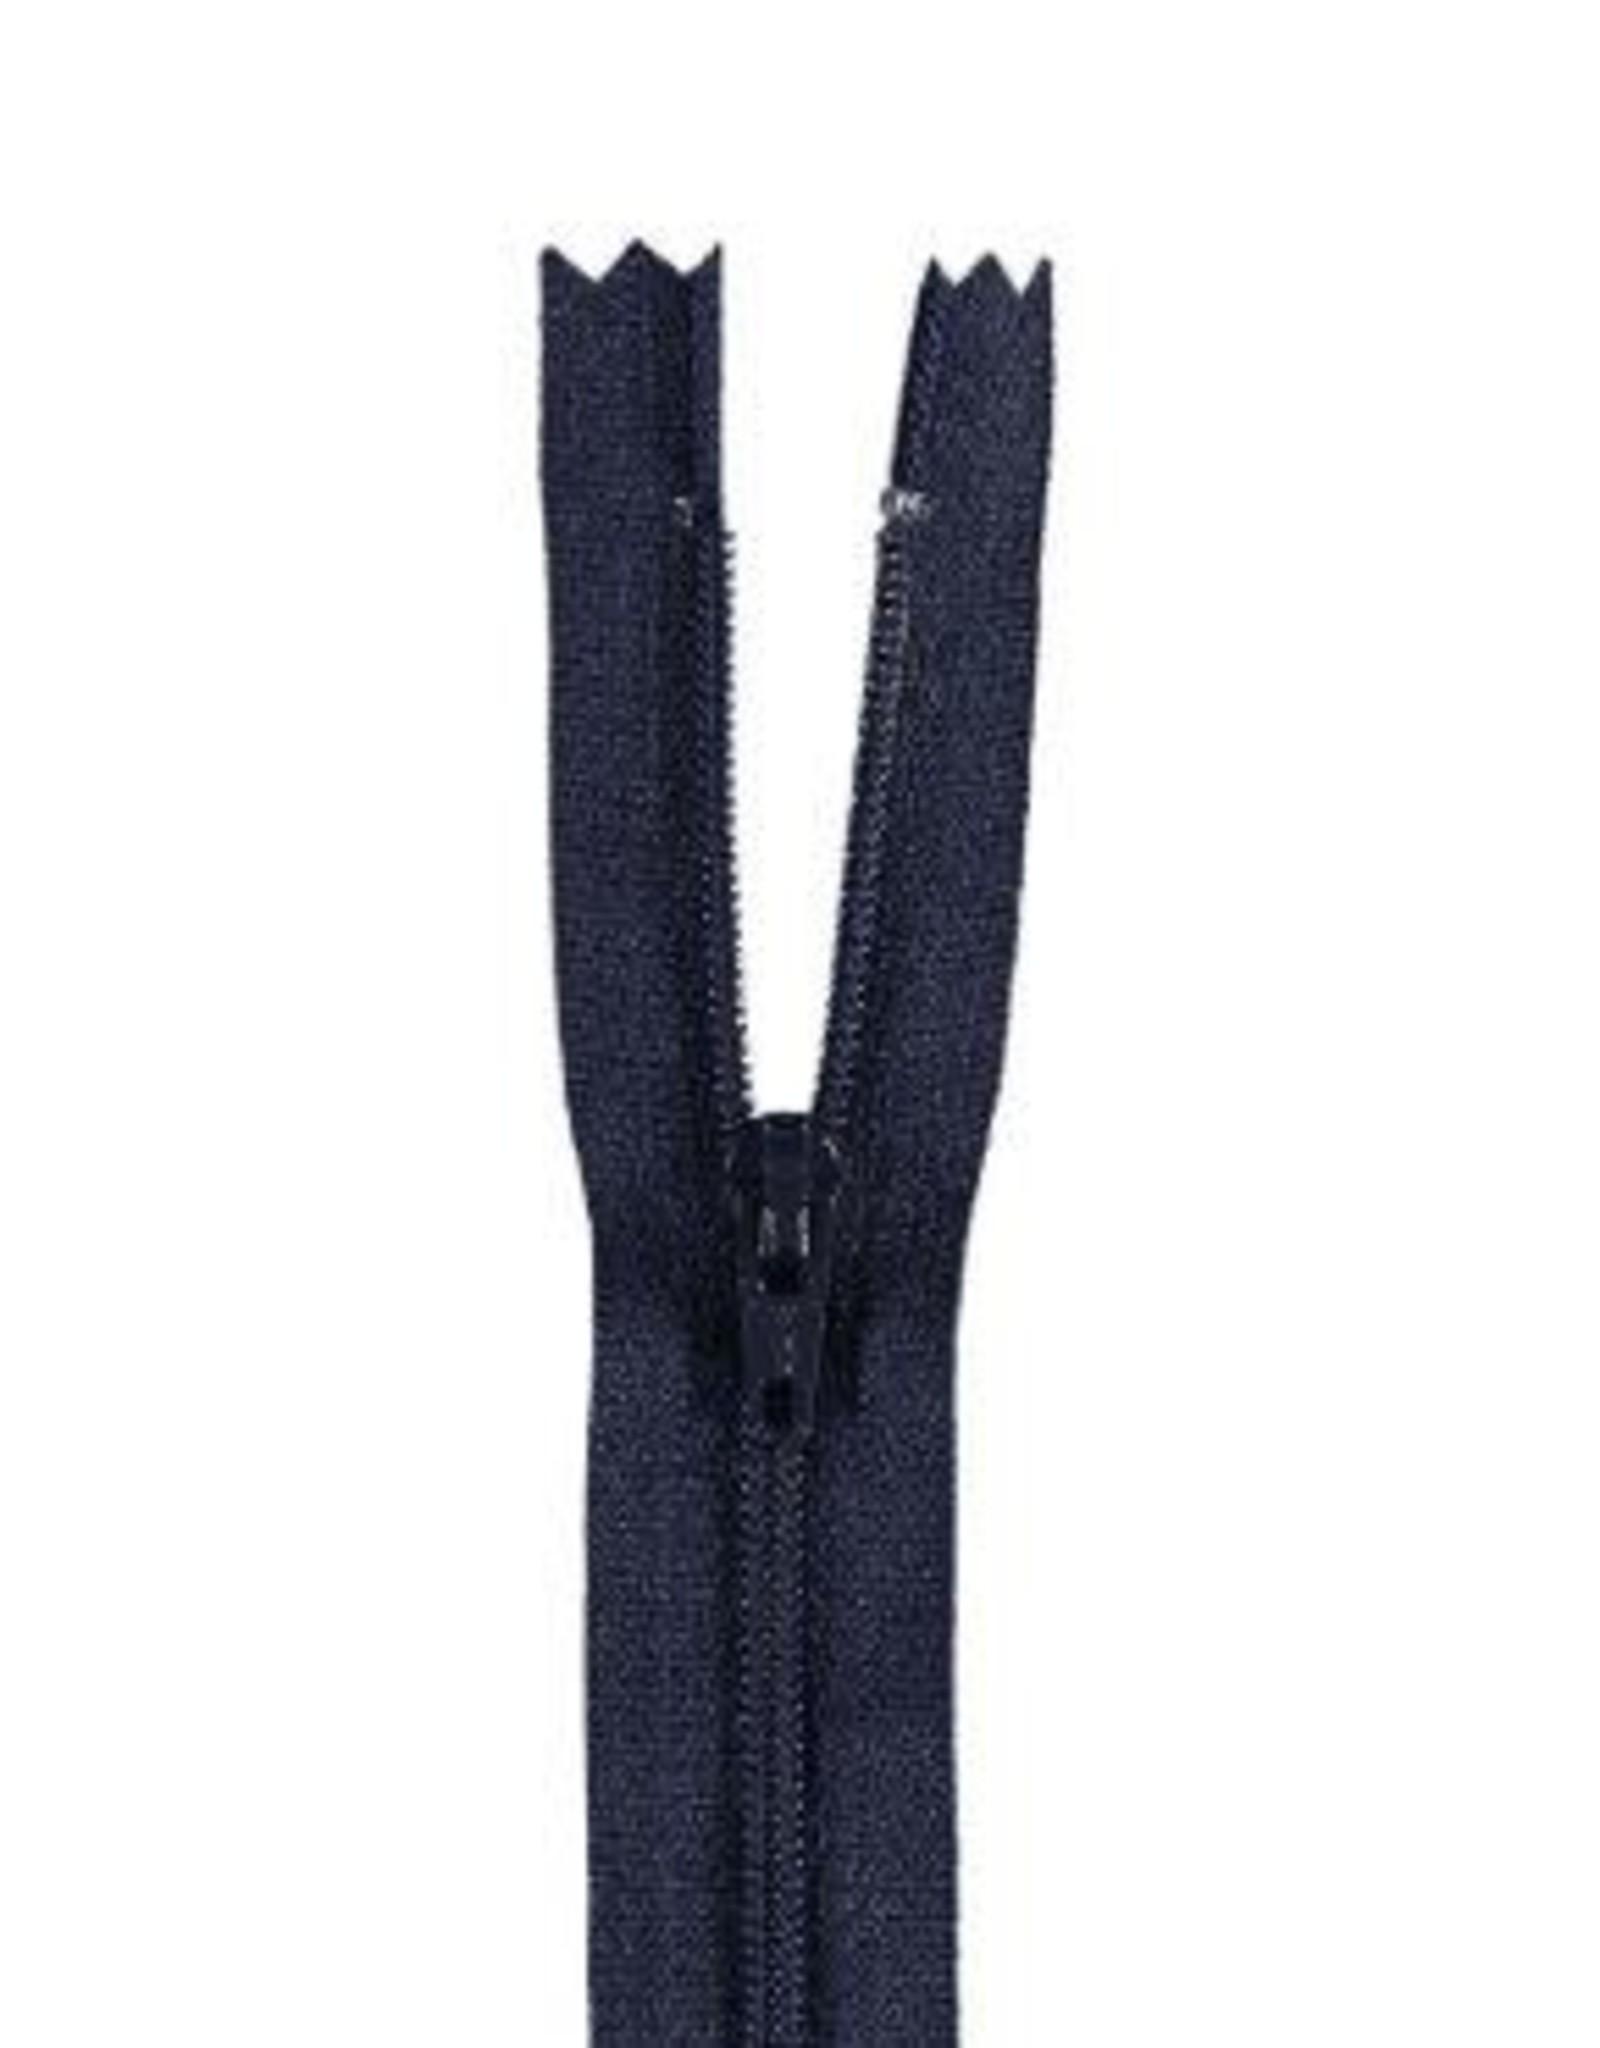 YKK Spiraalrits niet-DB 3mm d. blauw gr 168-22cm